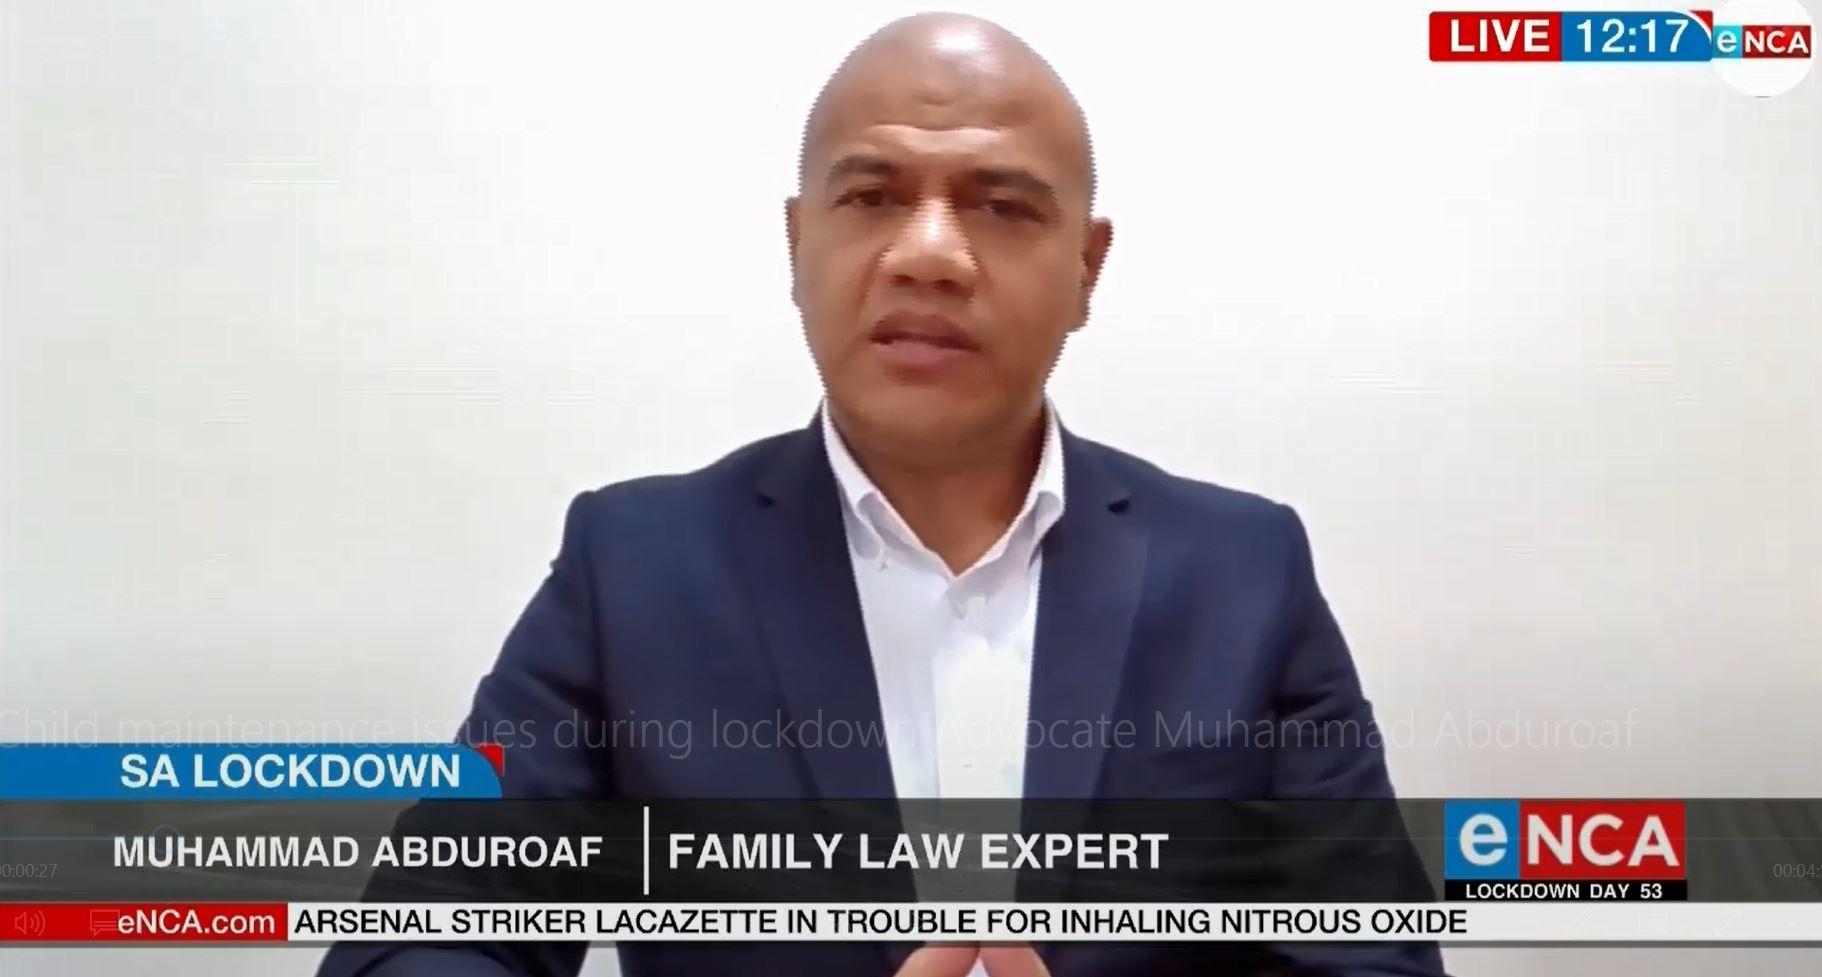 Advocate Muhammad Abduroaf